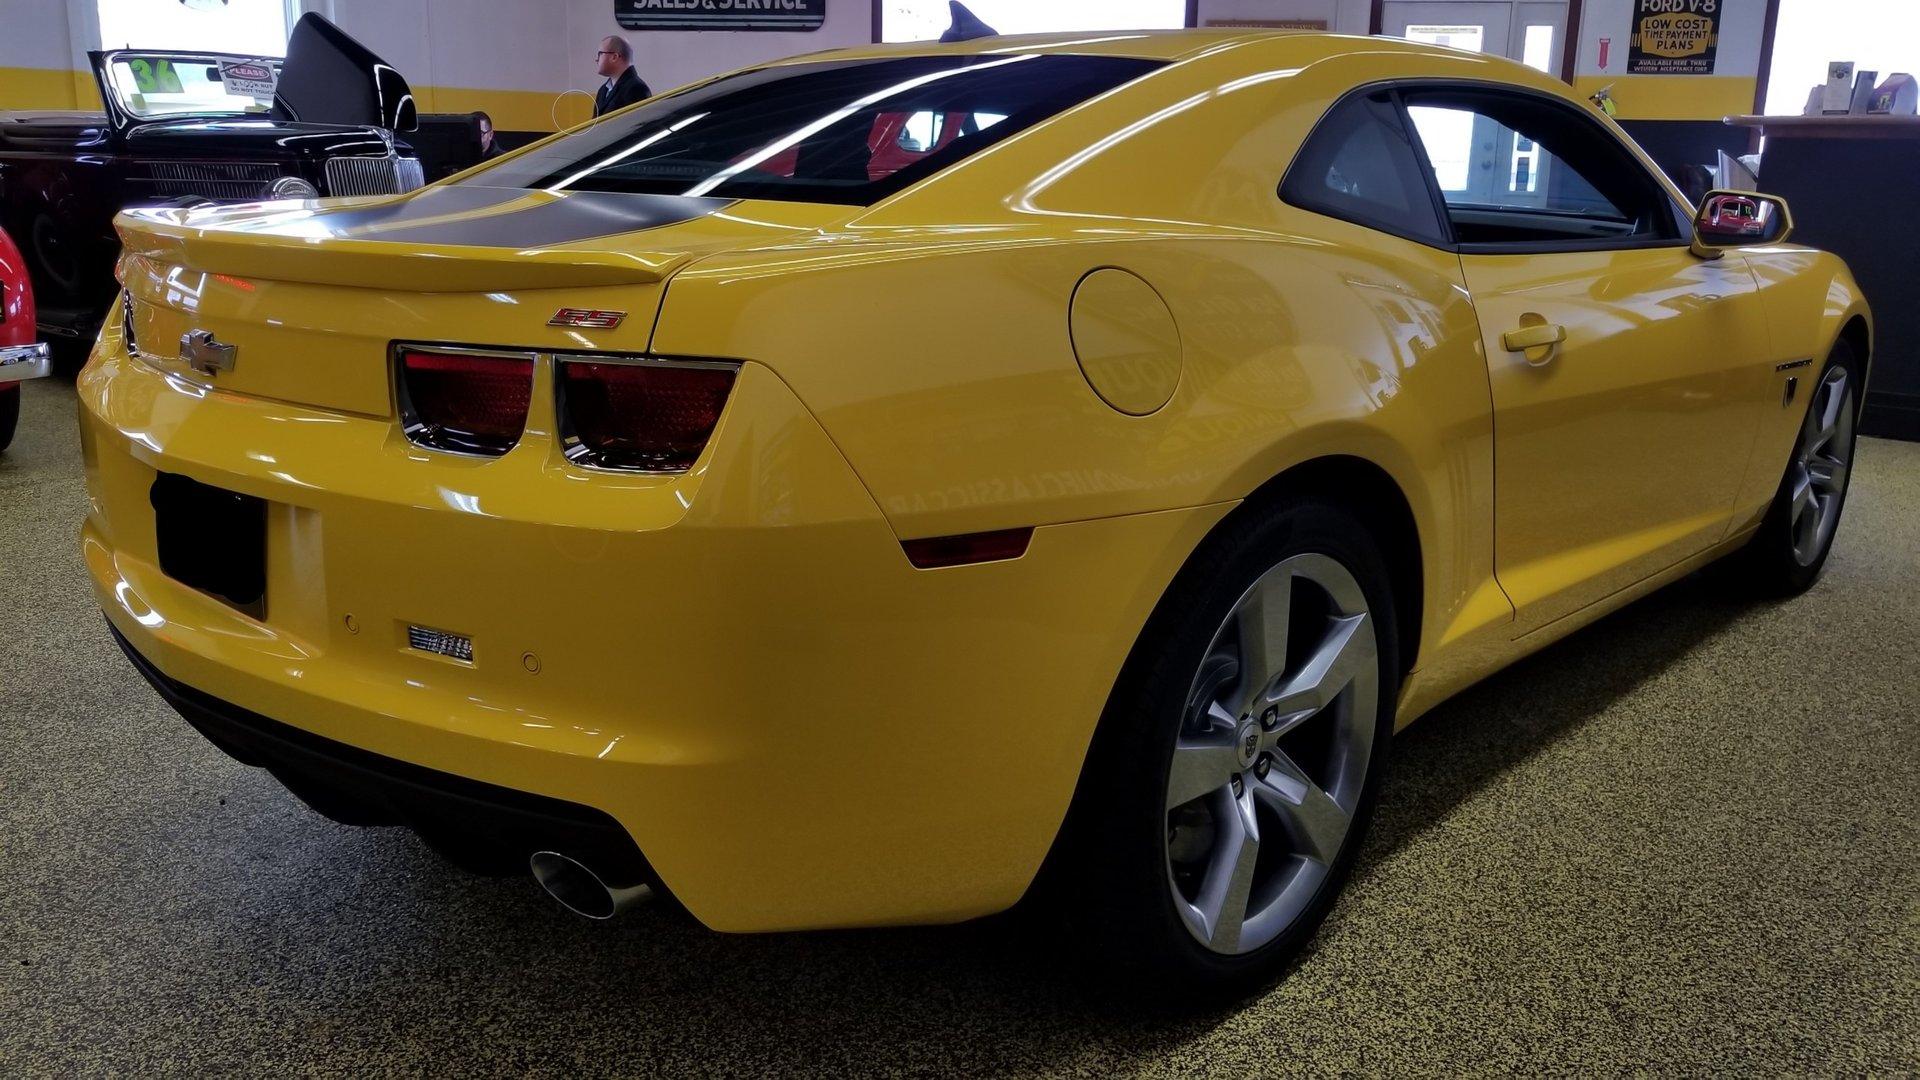 Kekurangan Chevrolet Camaro Olx Spesifikasi